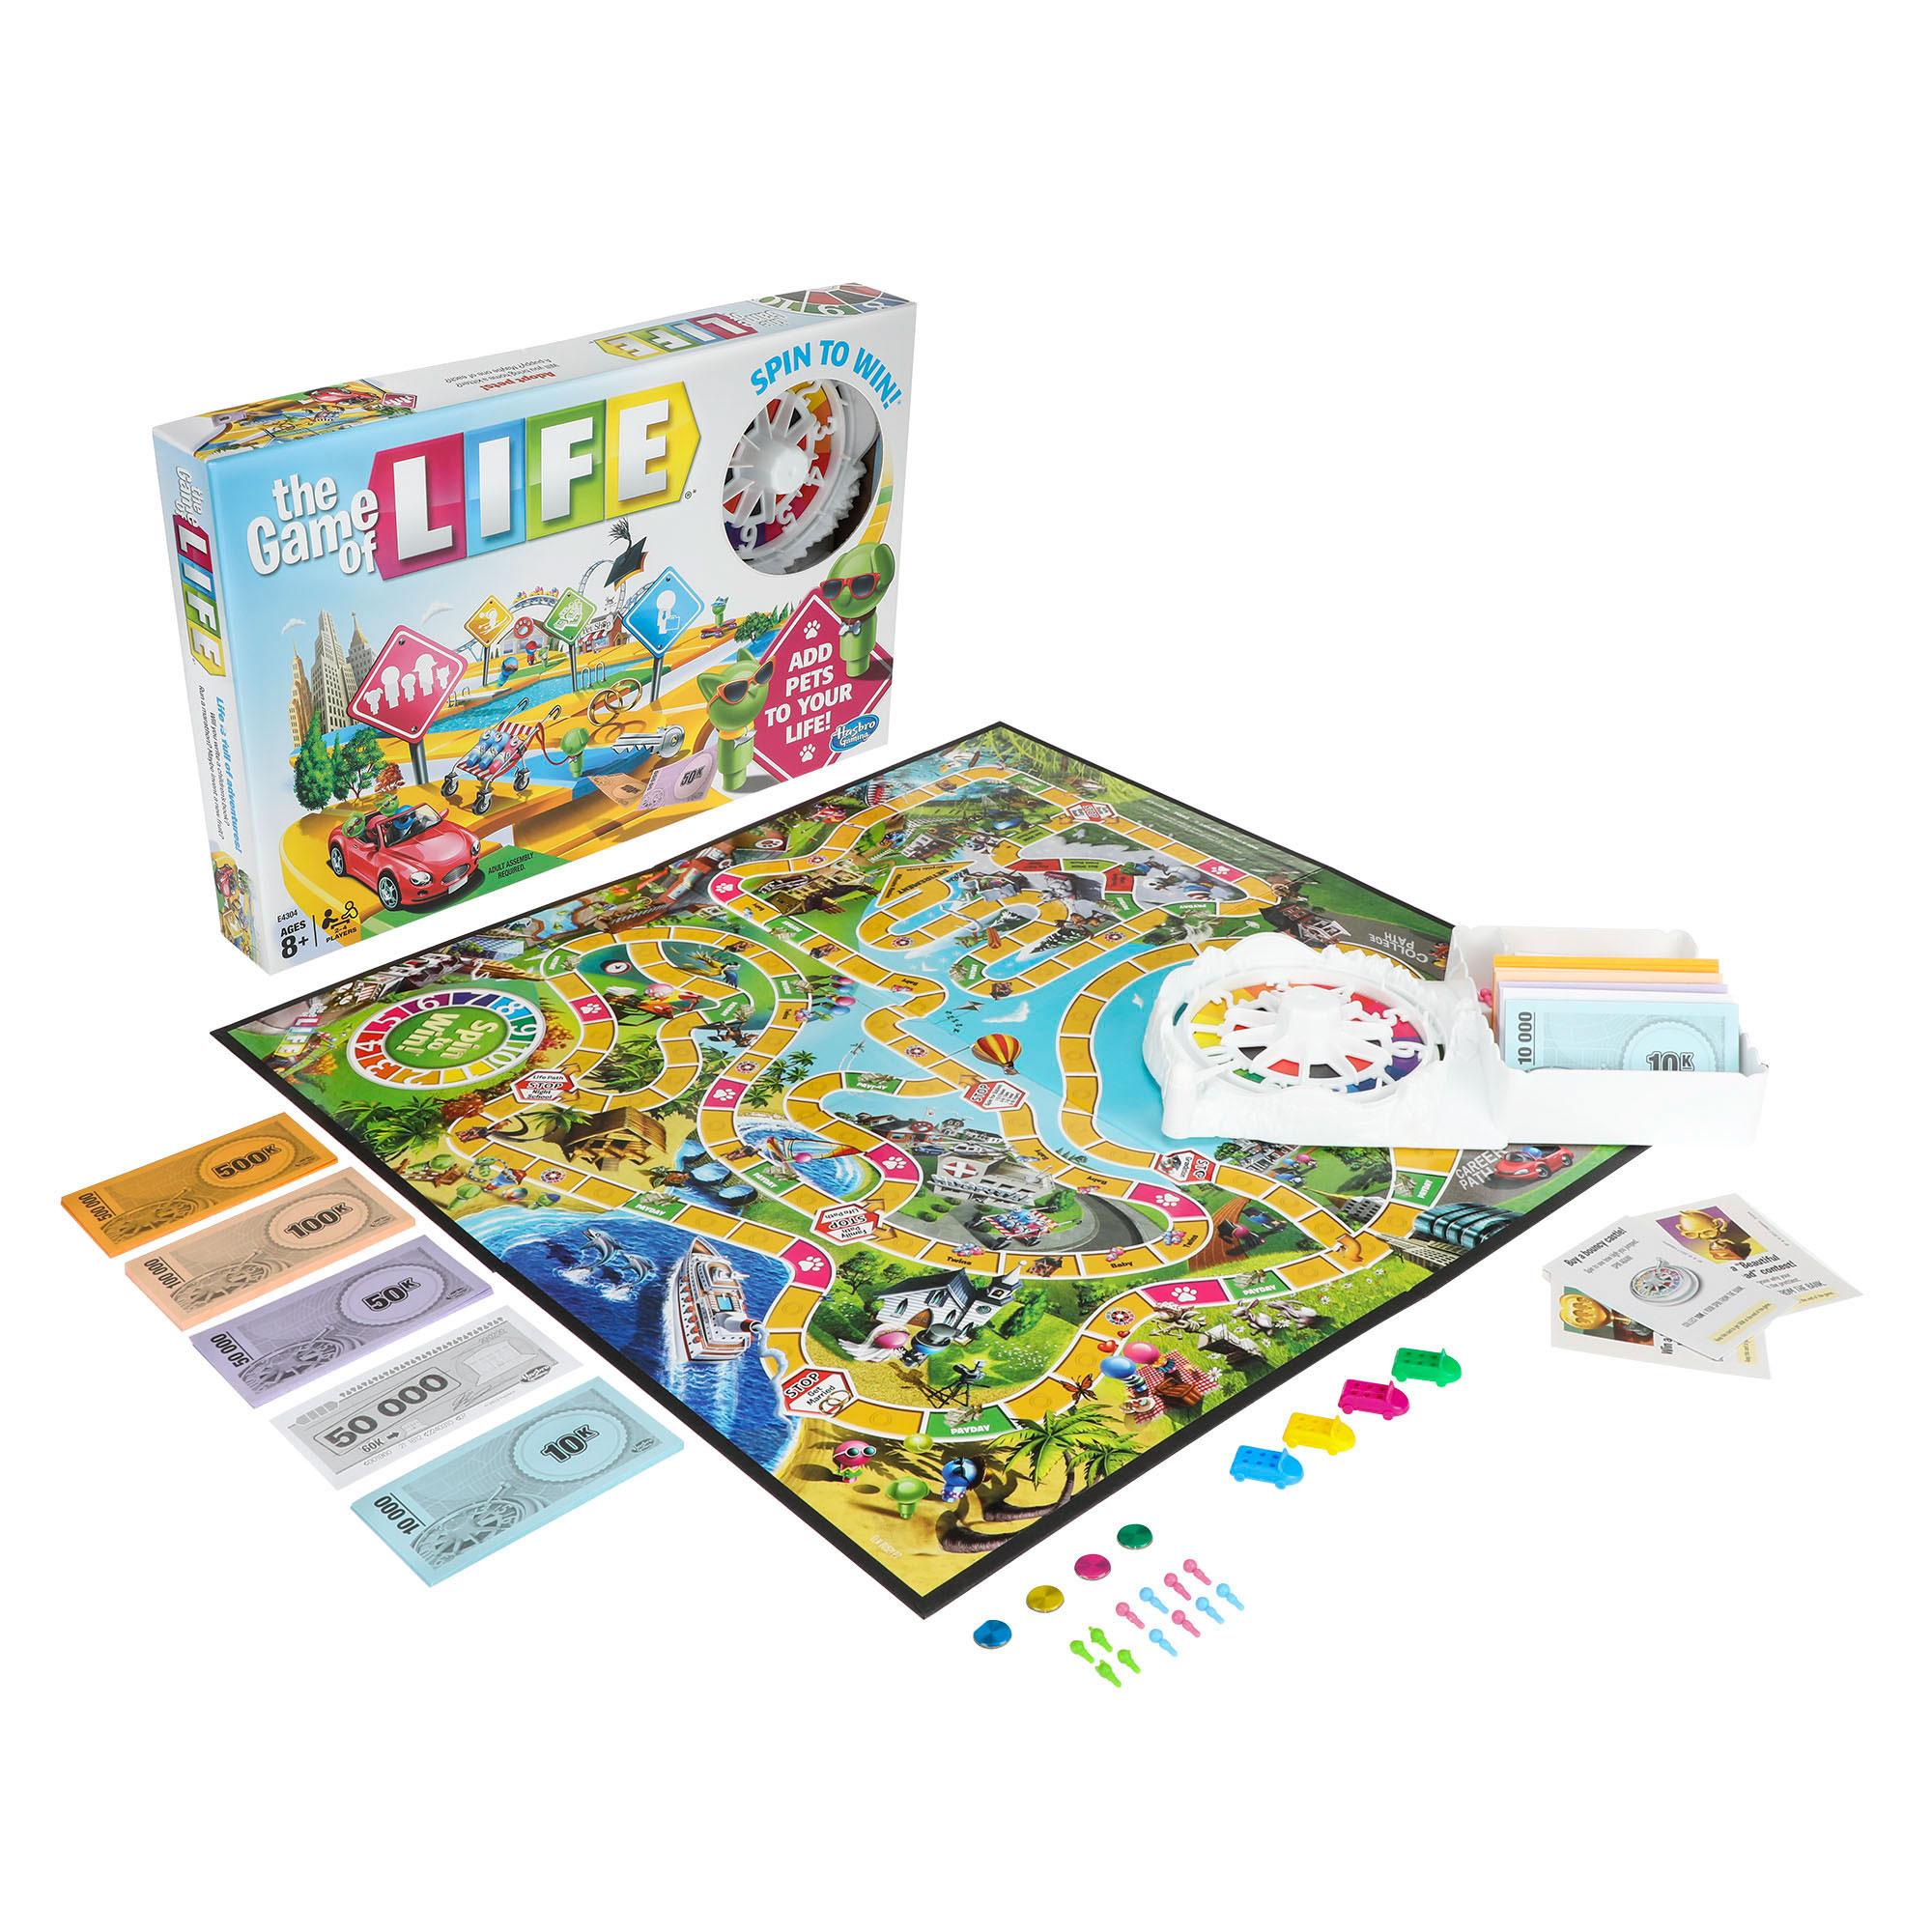 GAME OF LIFE E4304 - N54520